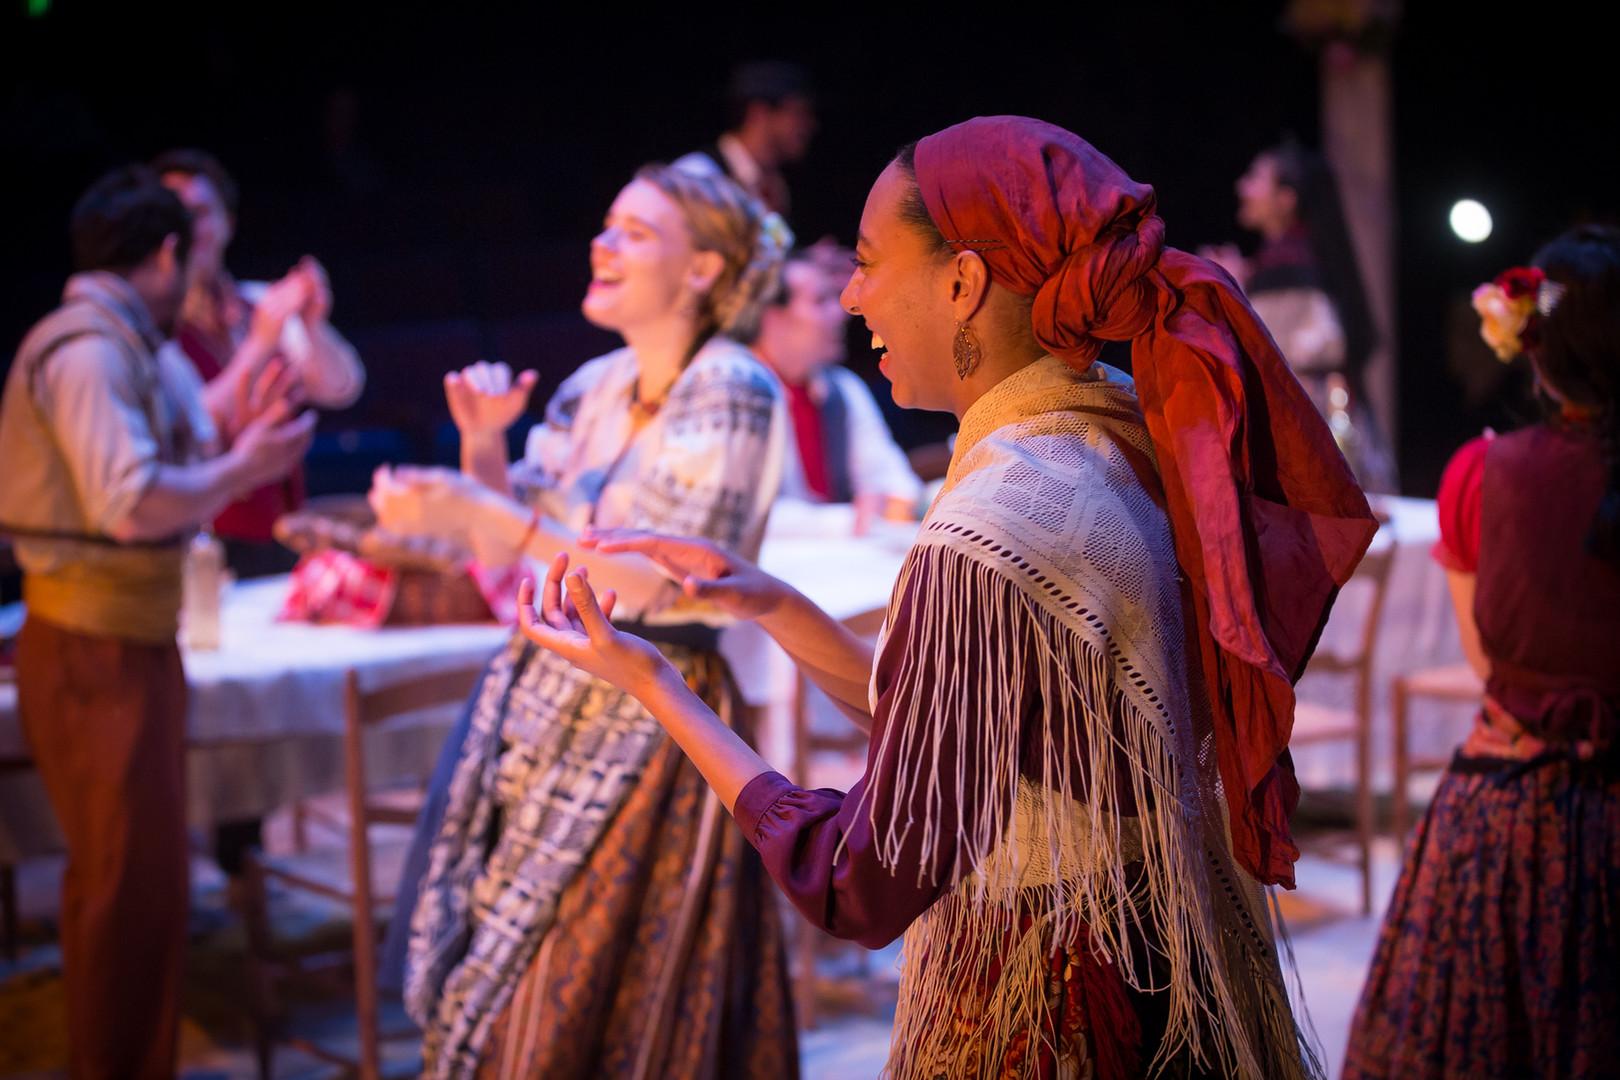 Blood Wedding by Federico Garcia Lorca Directed by Matt Dickson Rutgers Theatre Company